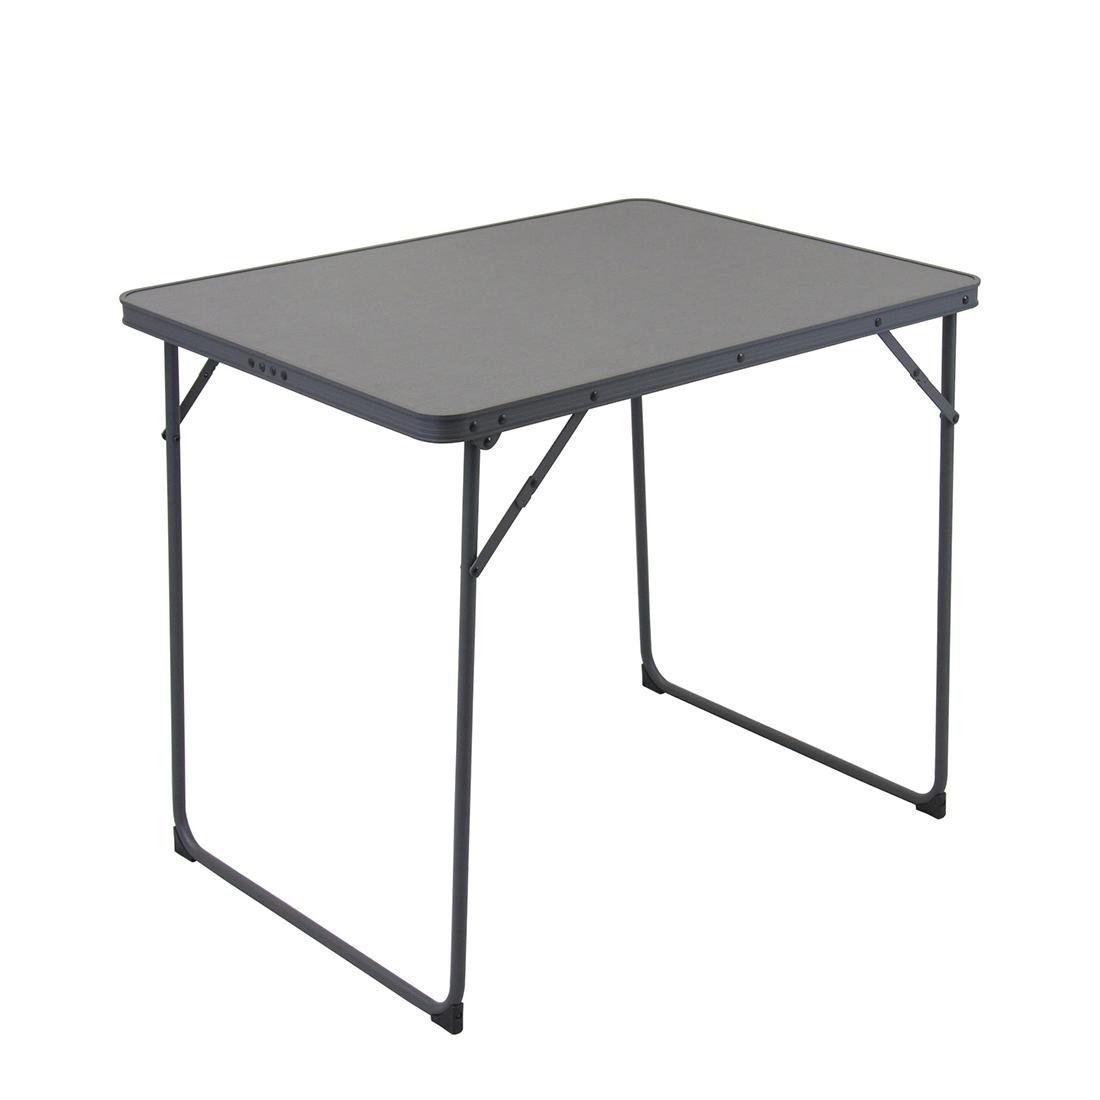 Portal Rock Table Campingtisch 60x80x70 Cm Leichter Klapptisch